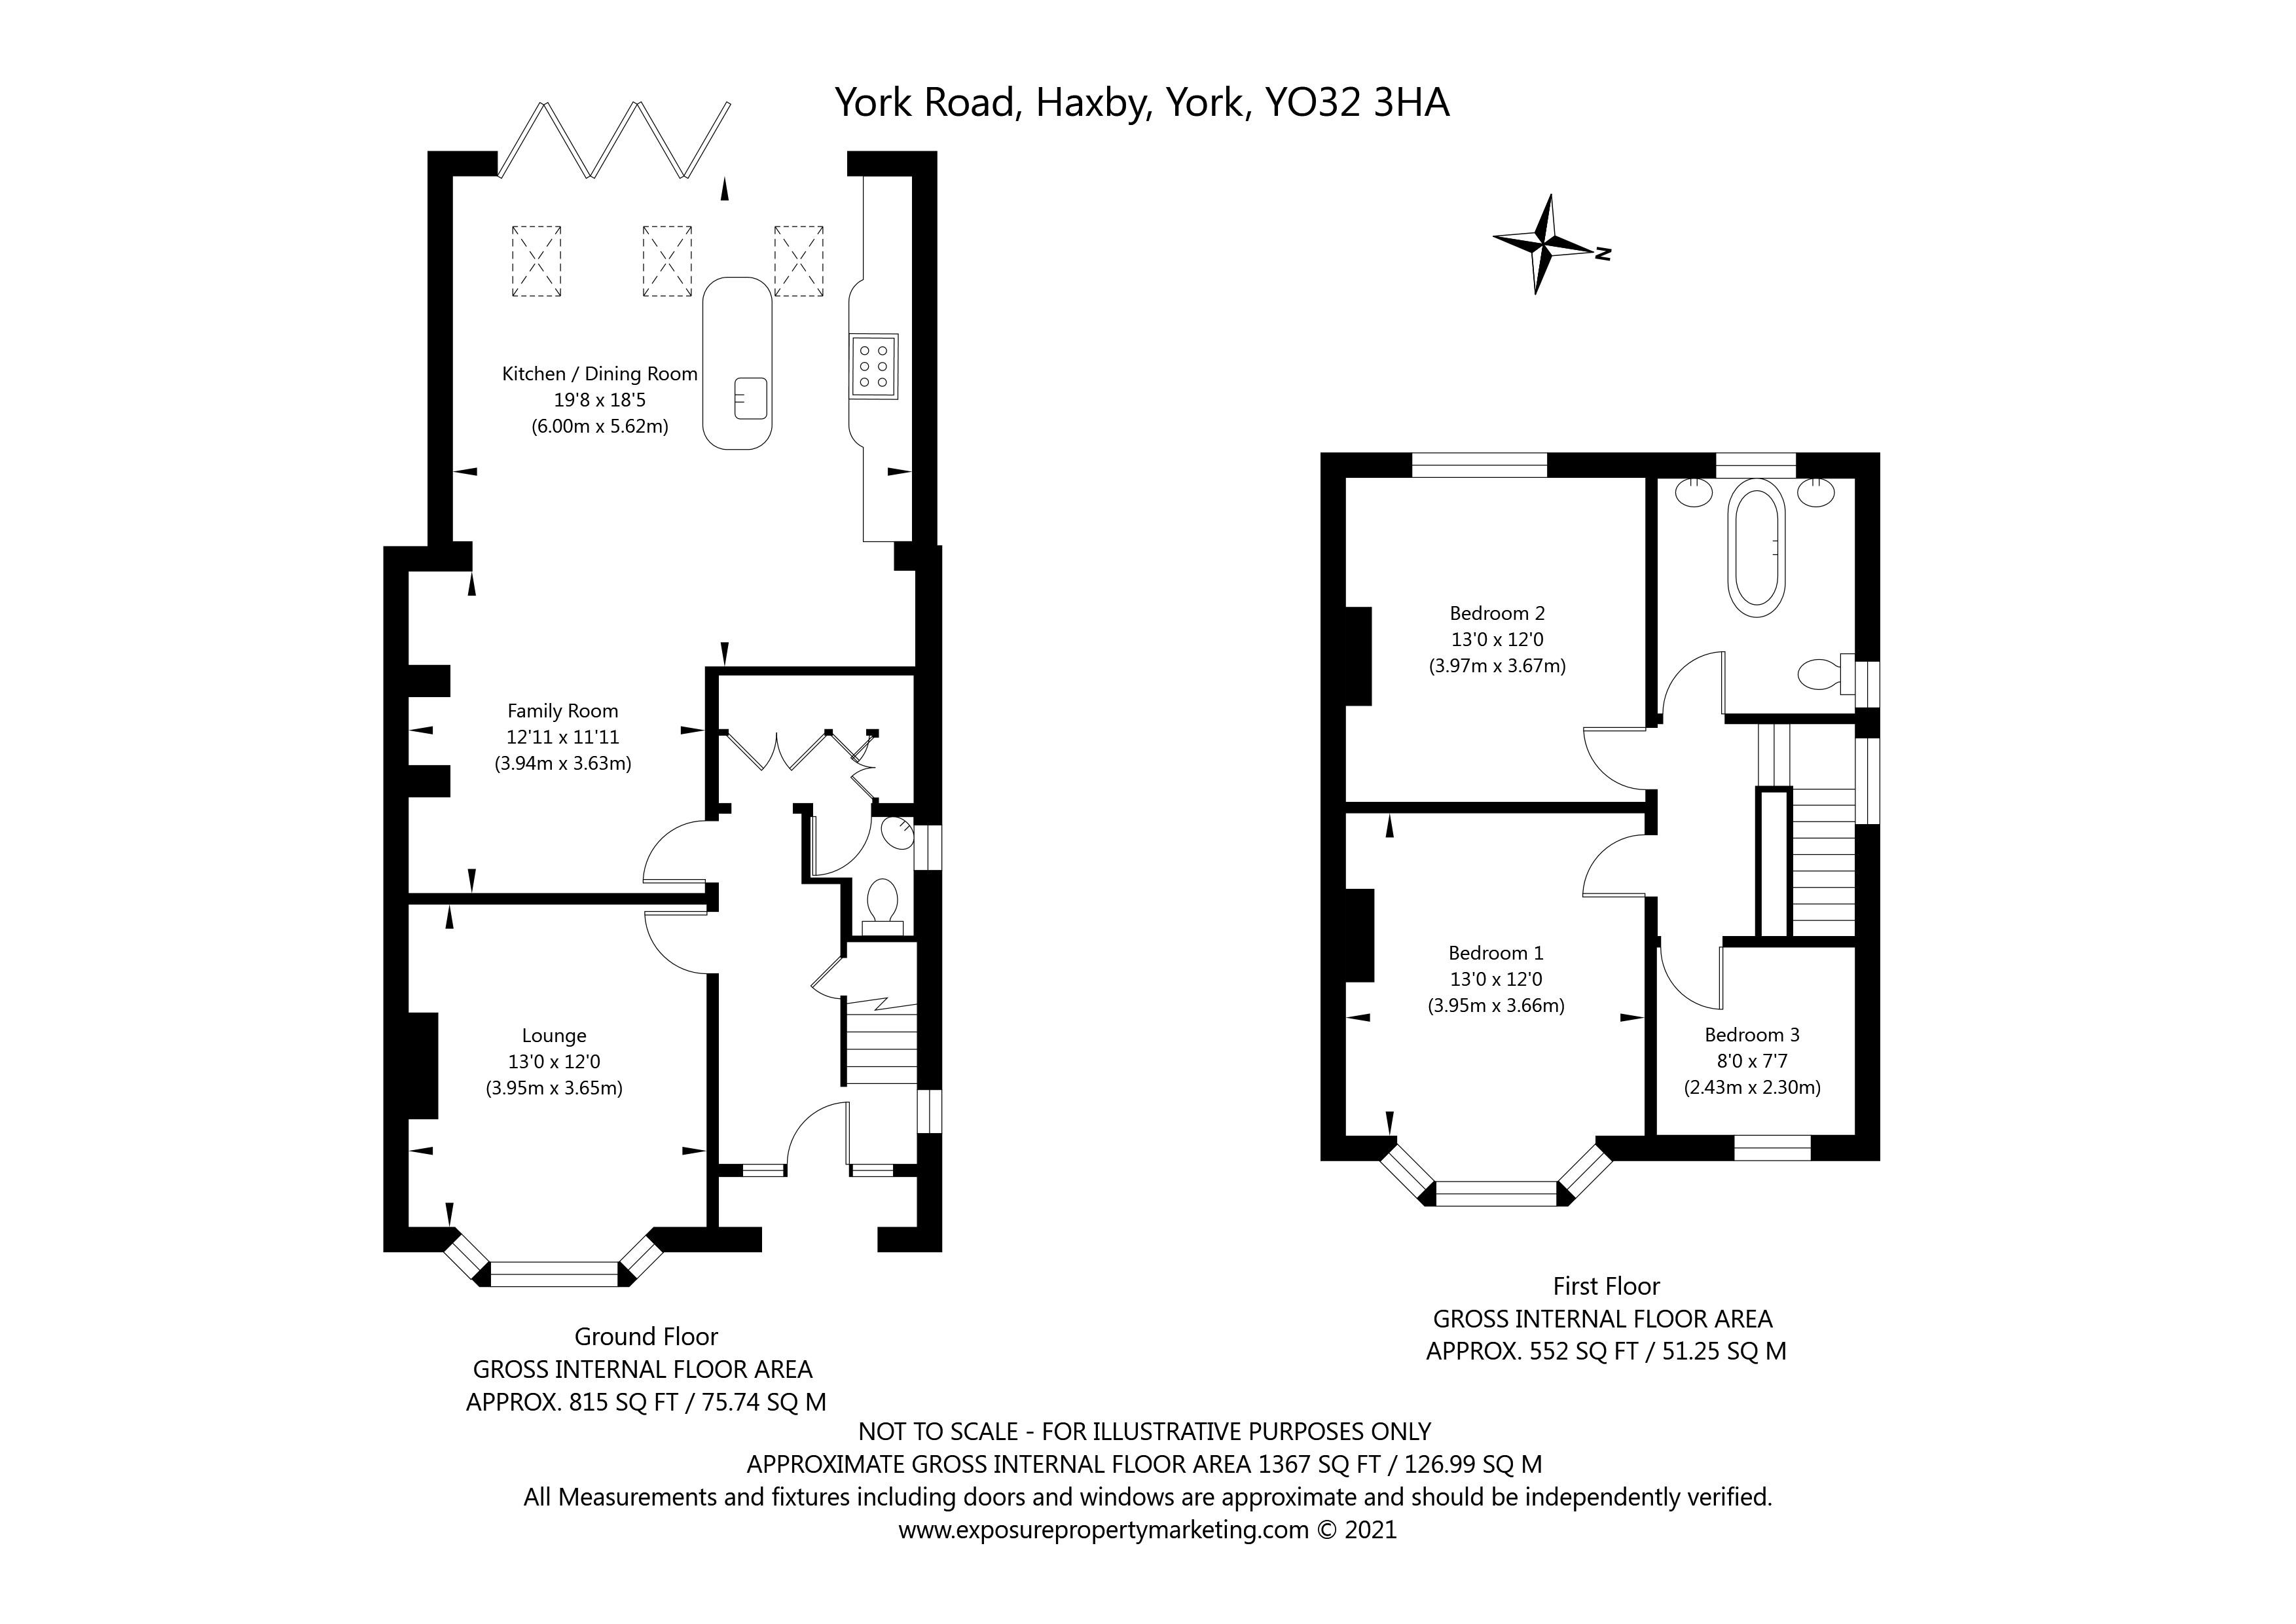 York Road, Haxby, York property floorplan